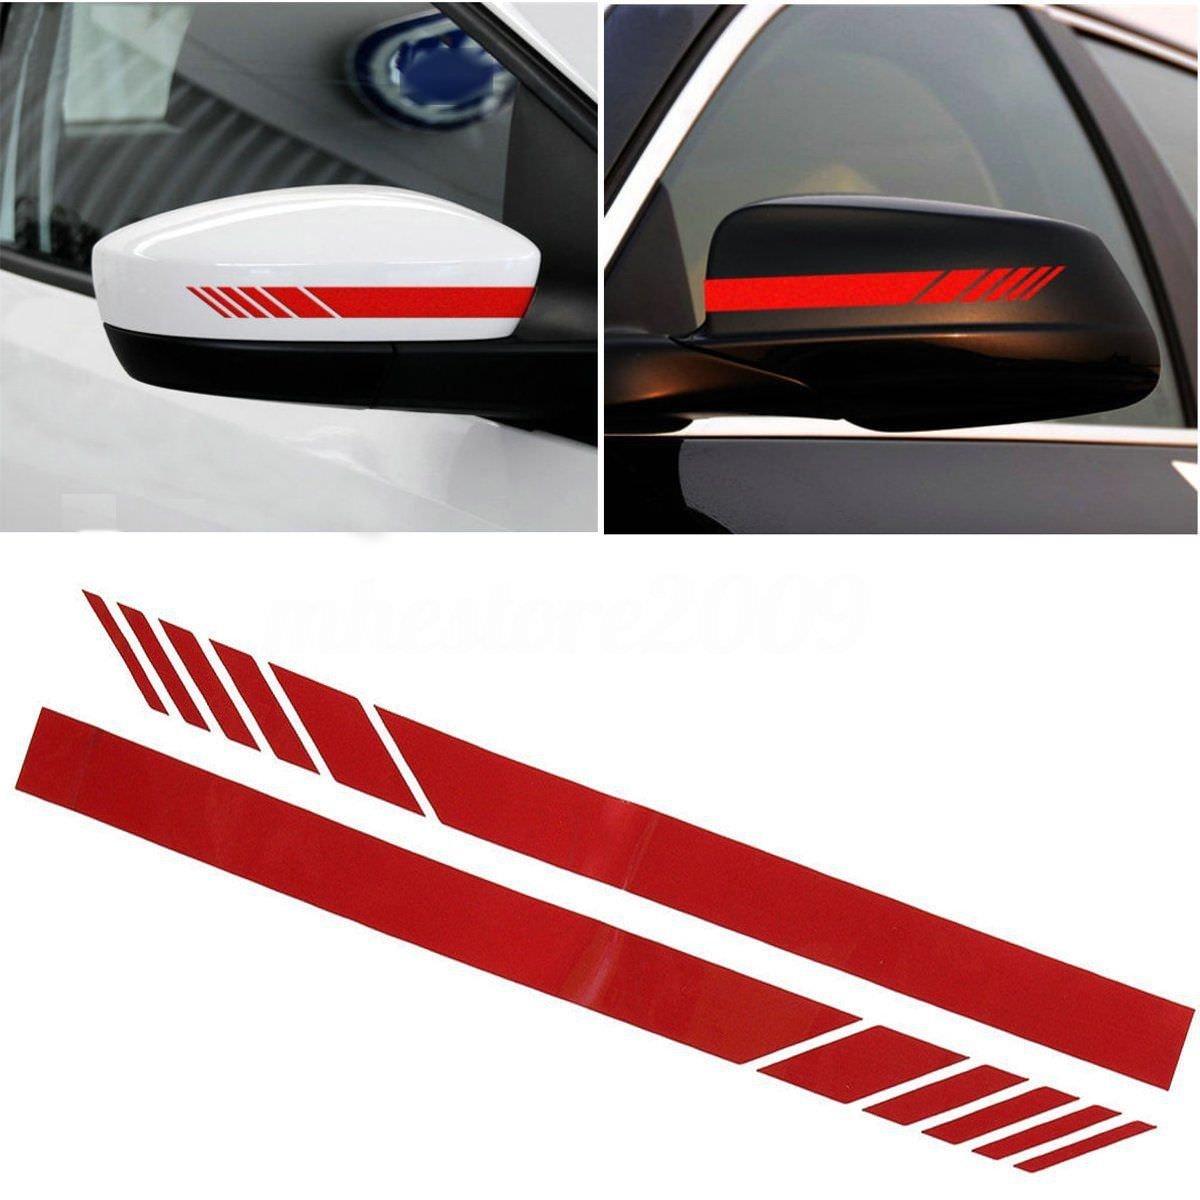 Cvanu car rearview mirror strip sticker vinyl racing decal emblem red for maruti suzuki alto 800 amazon in car motorbike